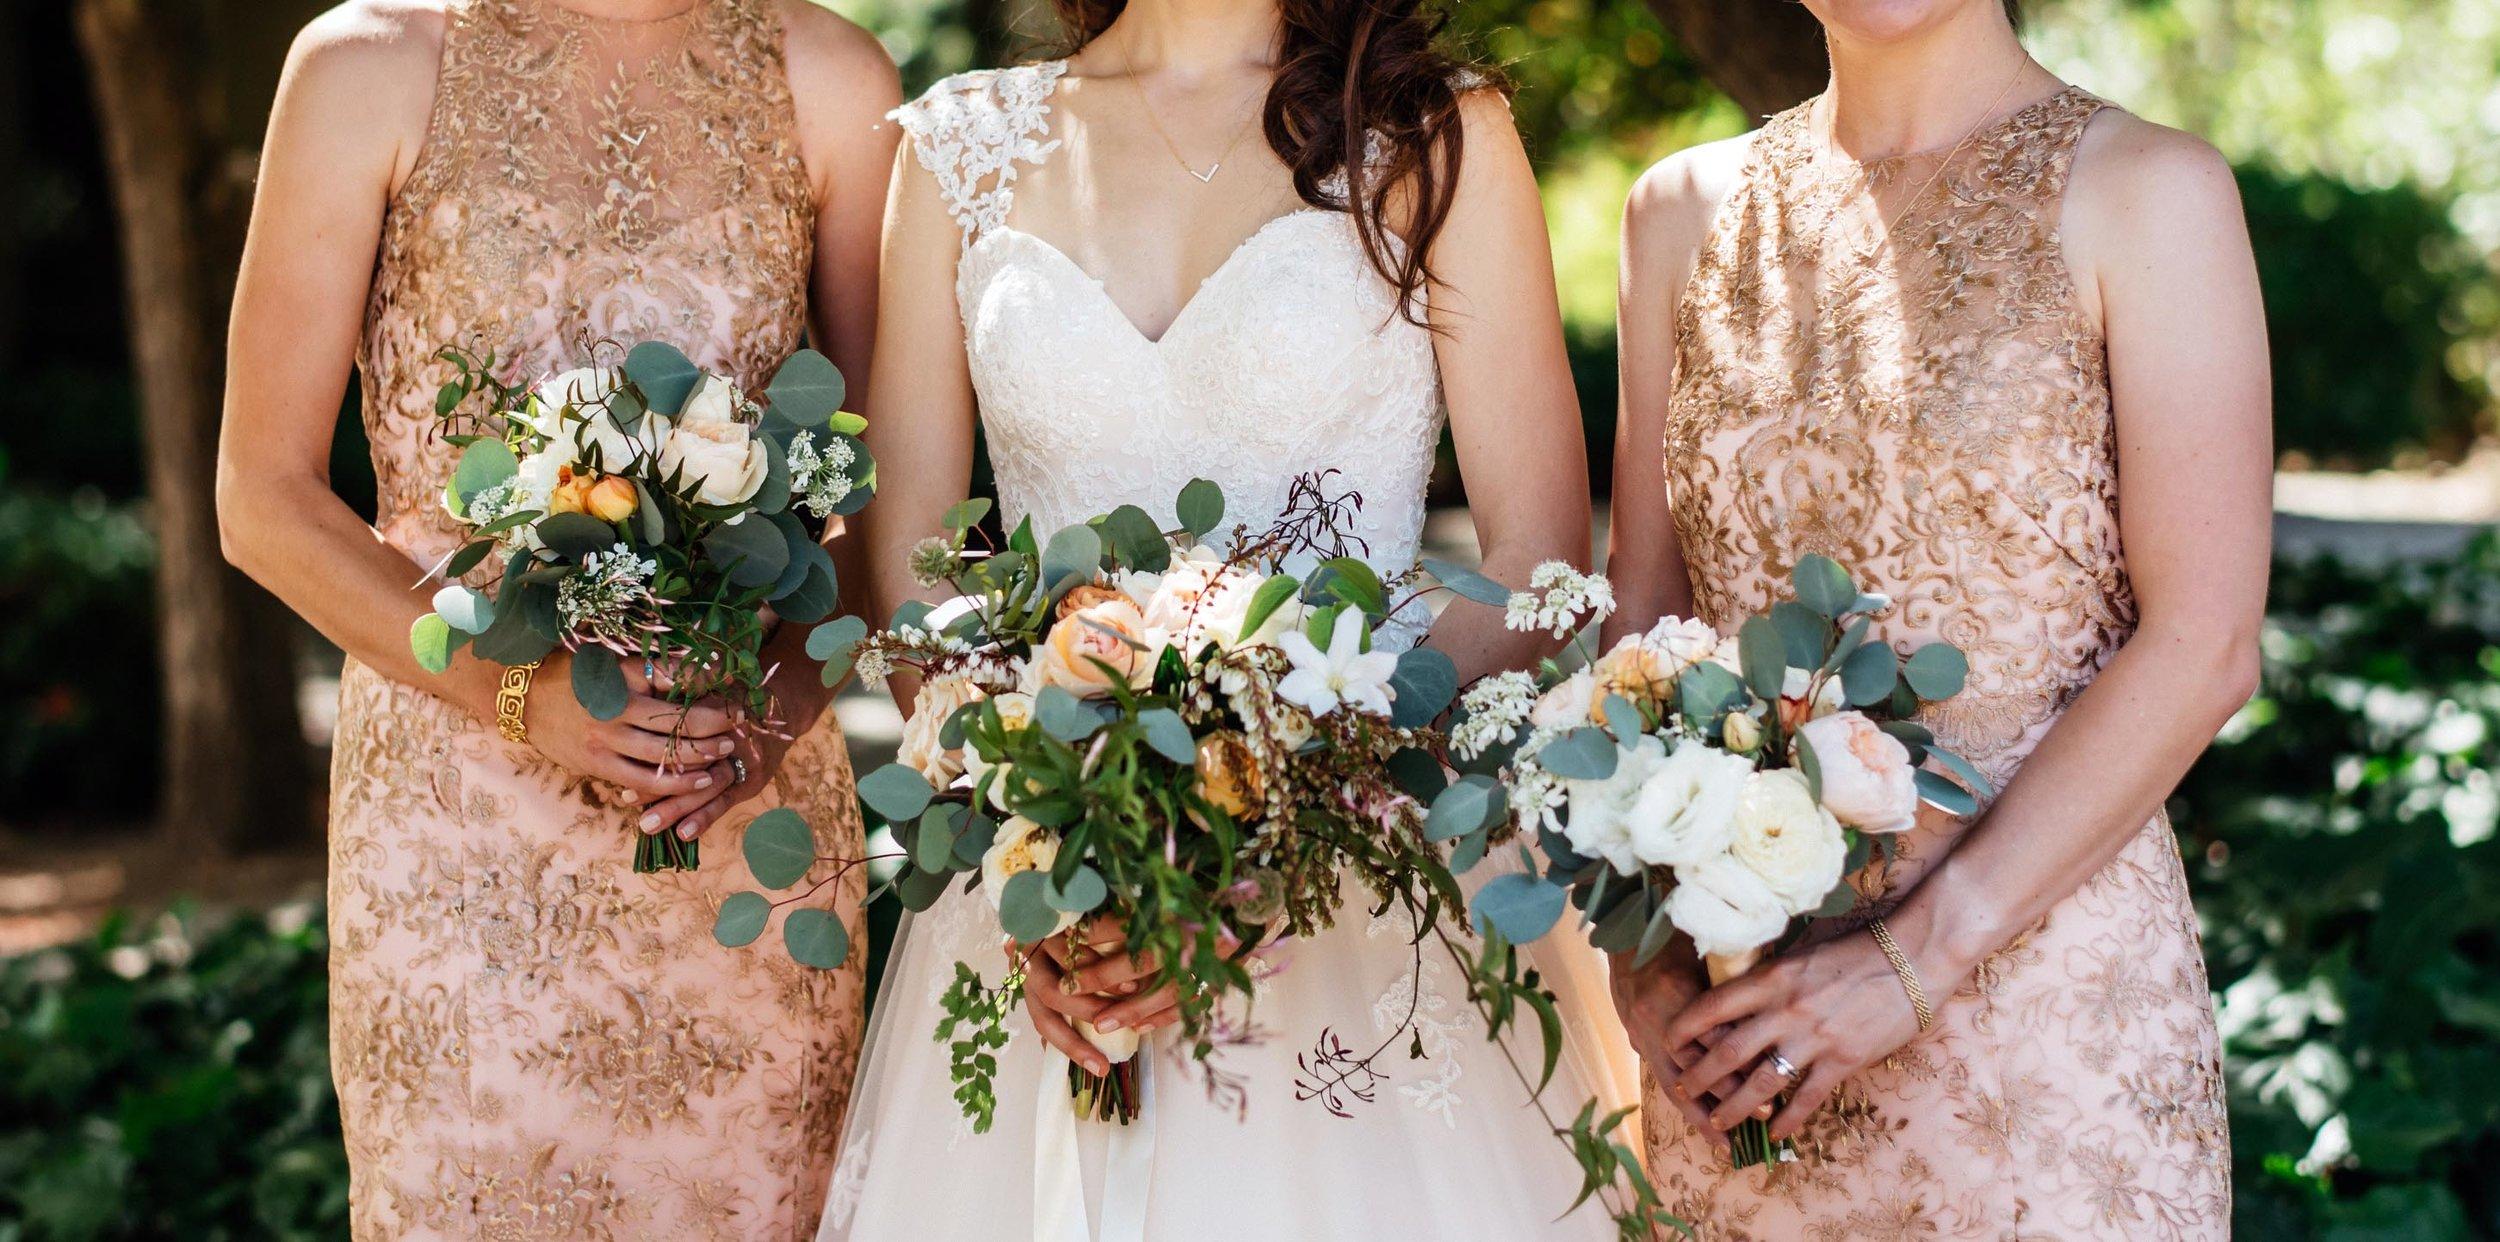 day-of-jewelry-for-bridesmaids-lab-diamonds.jpg